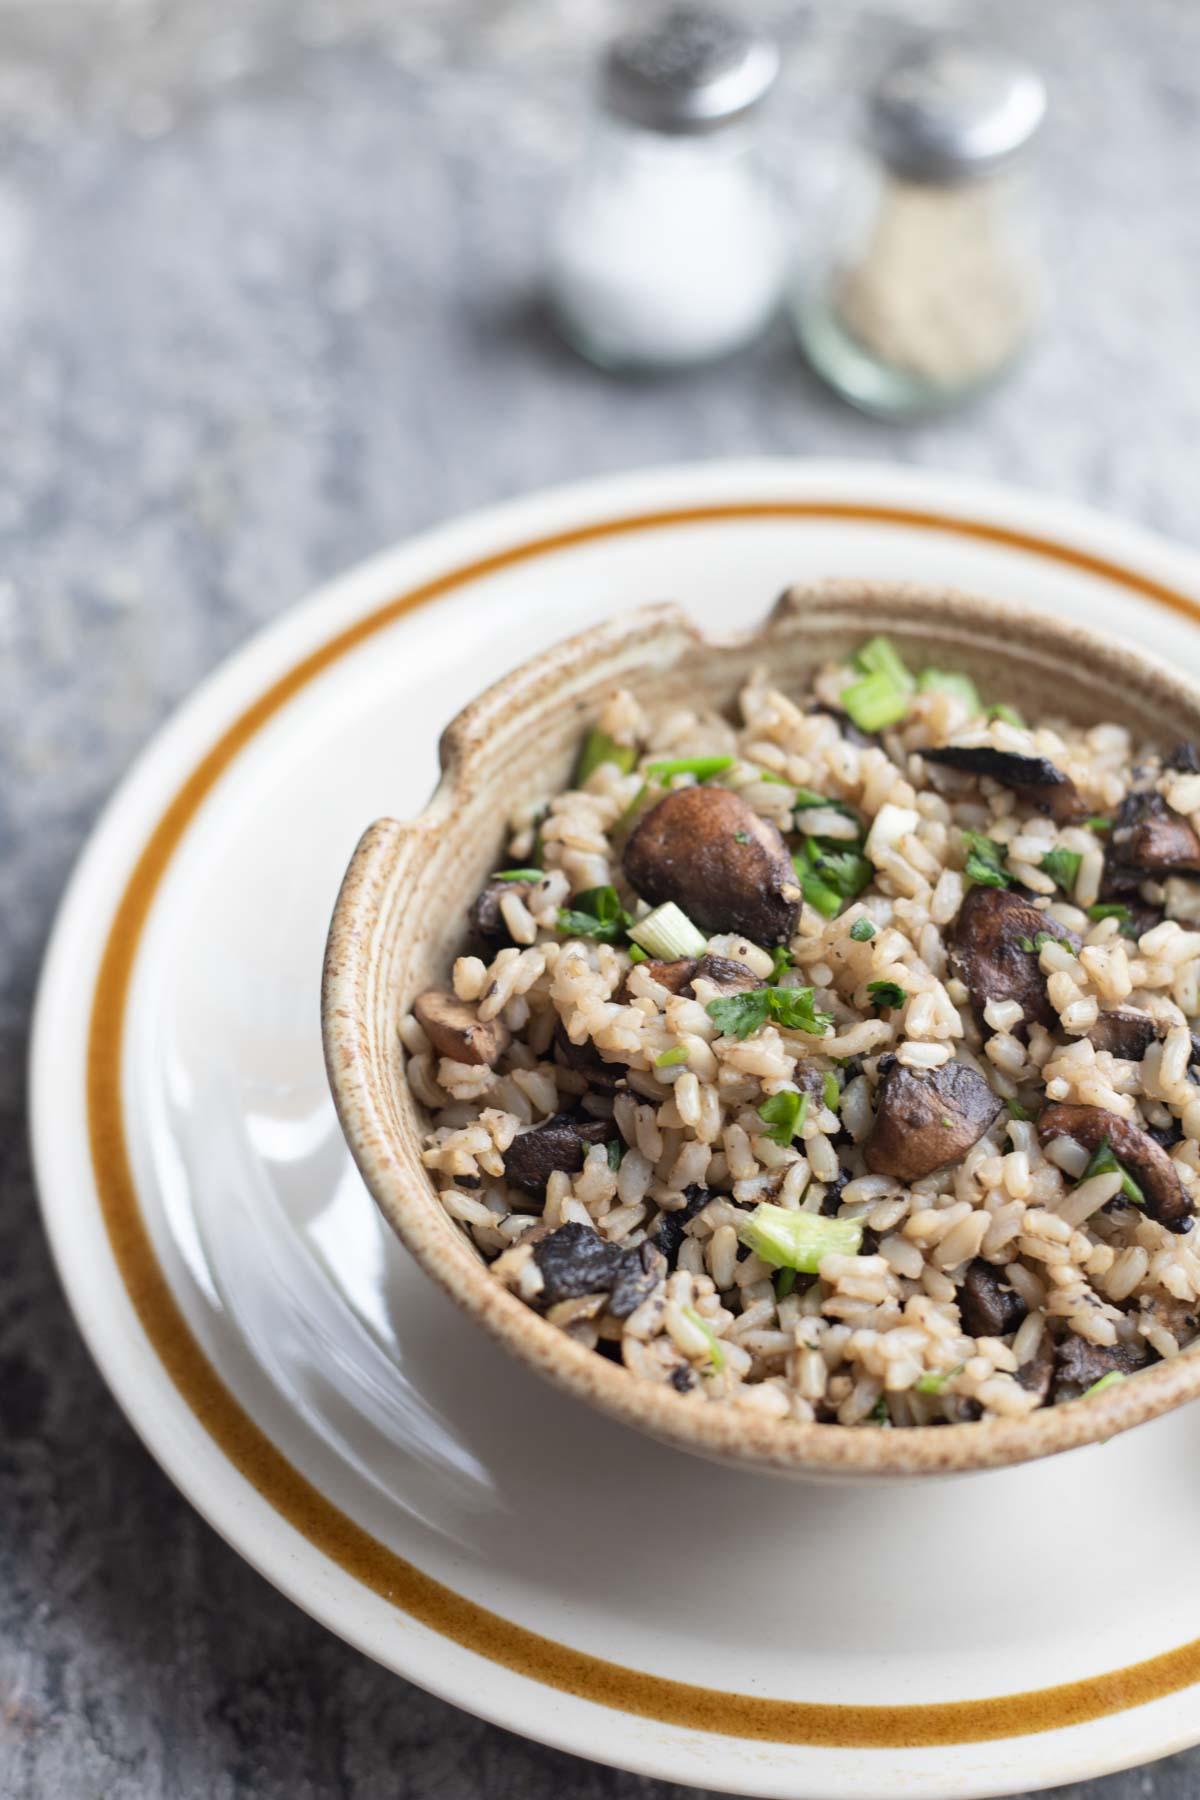 a bowl of mushroom fried rice with chopsticks